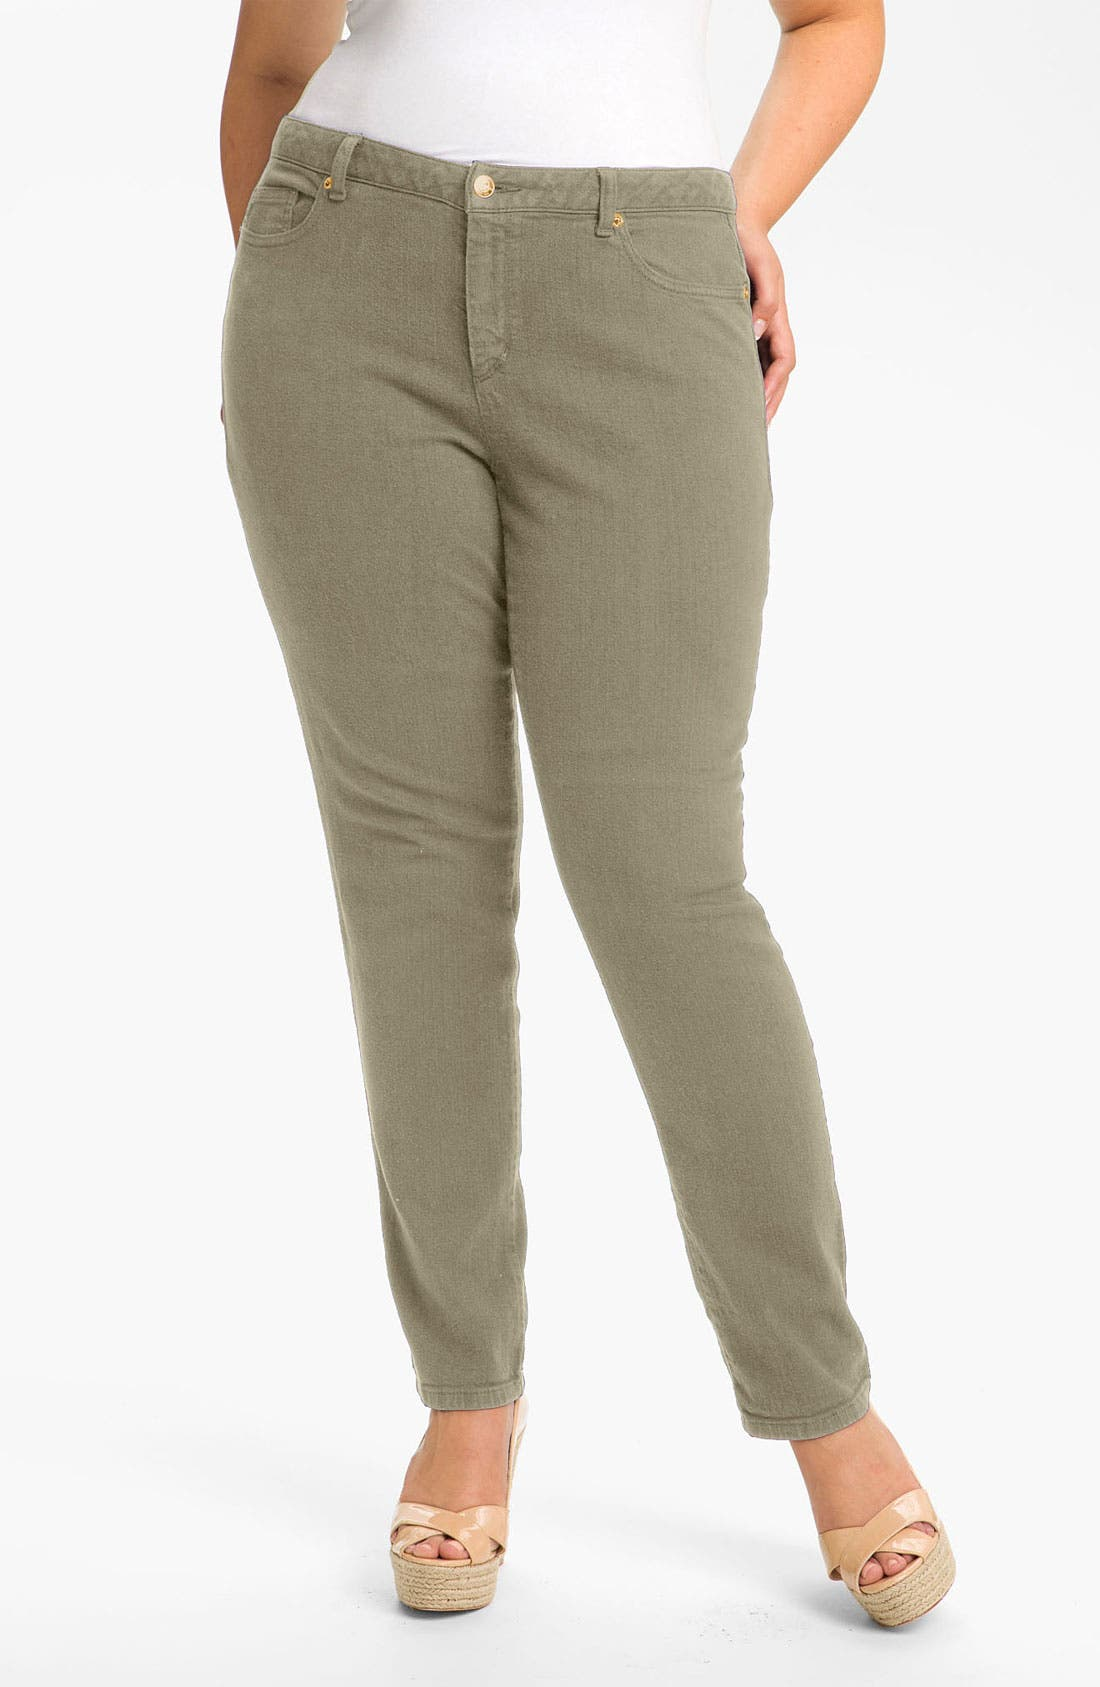 Alternate Image 1 Selected - MICHAEL Michael Kors Colored Skinny Jeans (Plus)